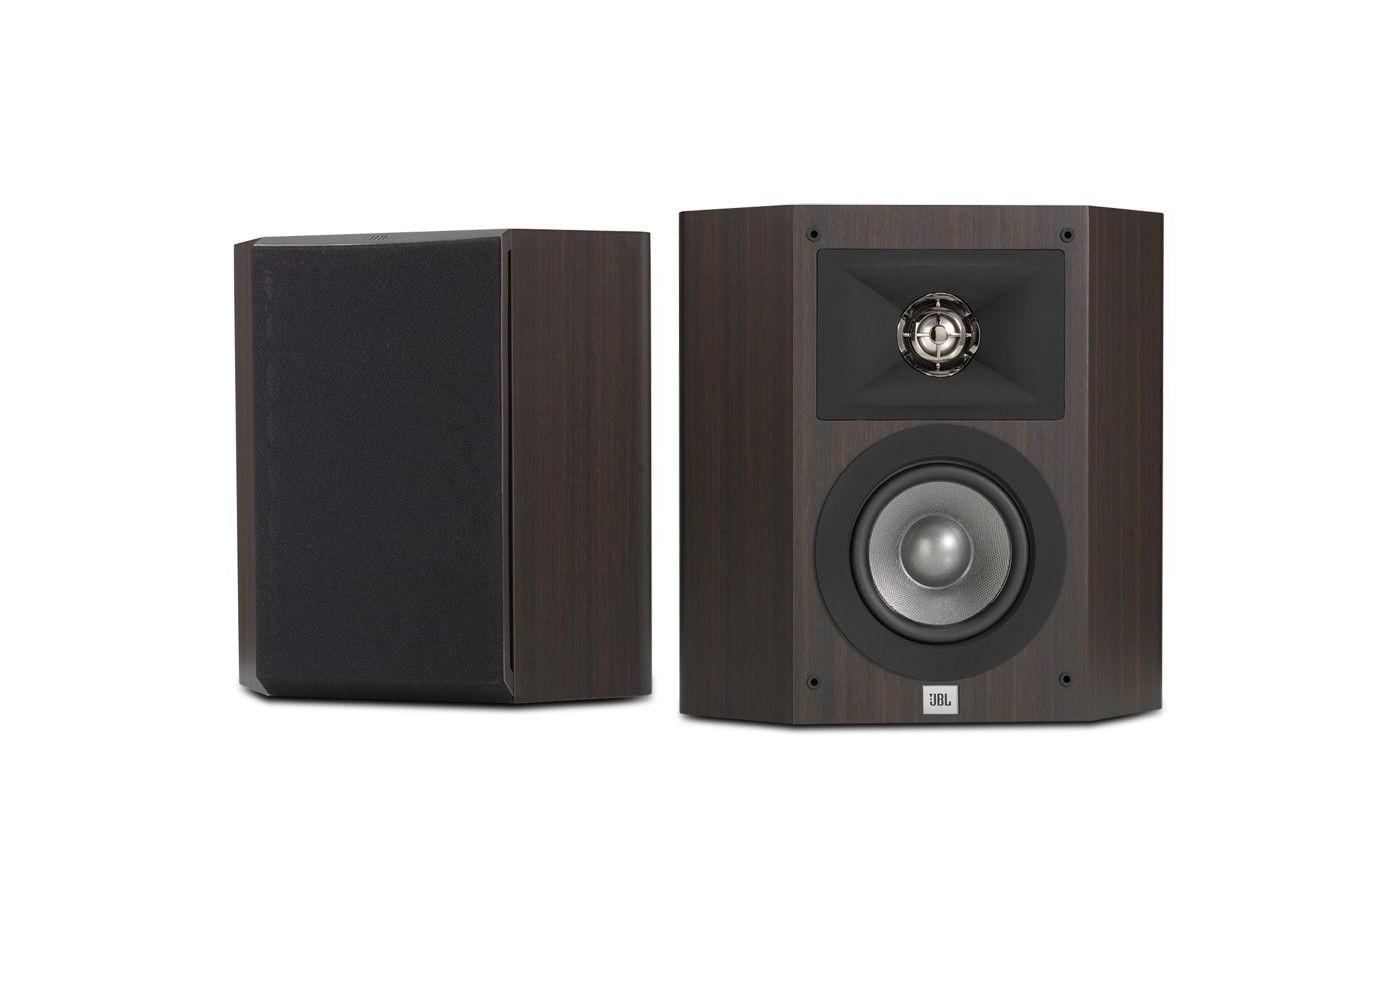 Jbl Studio 210 Stylish 2 Way 4 Inch Surround Speakers